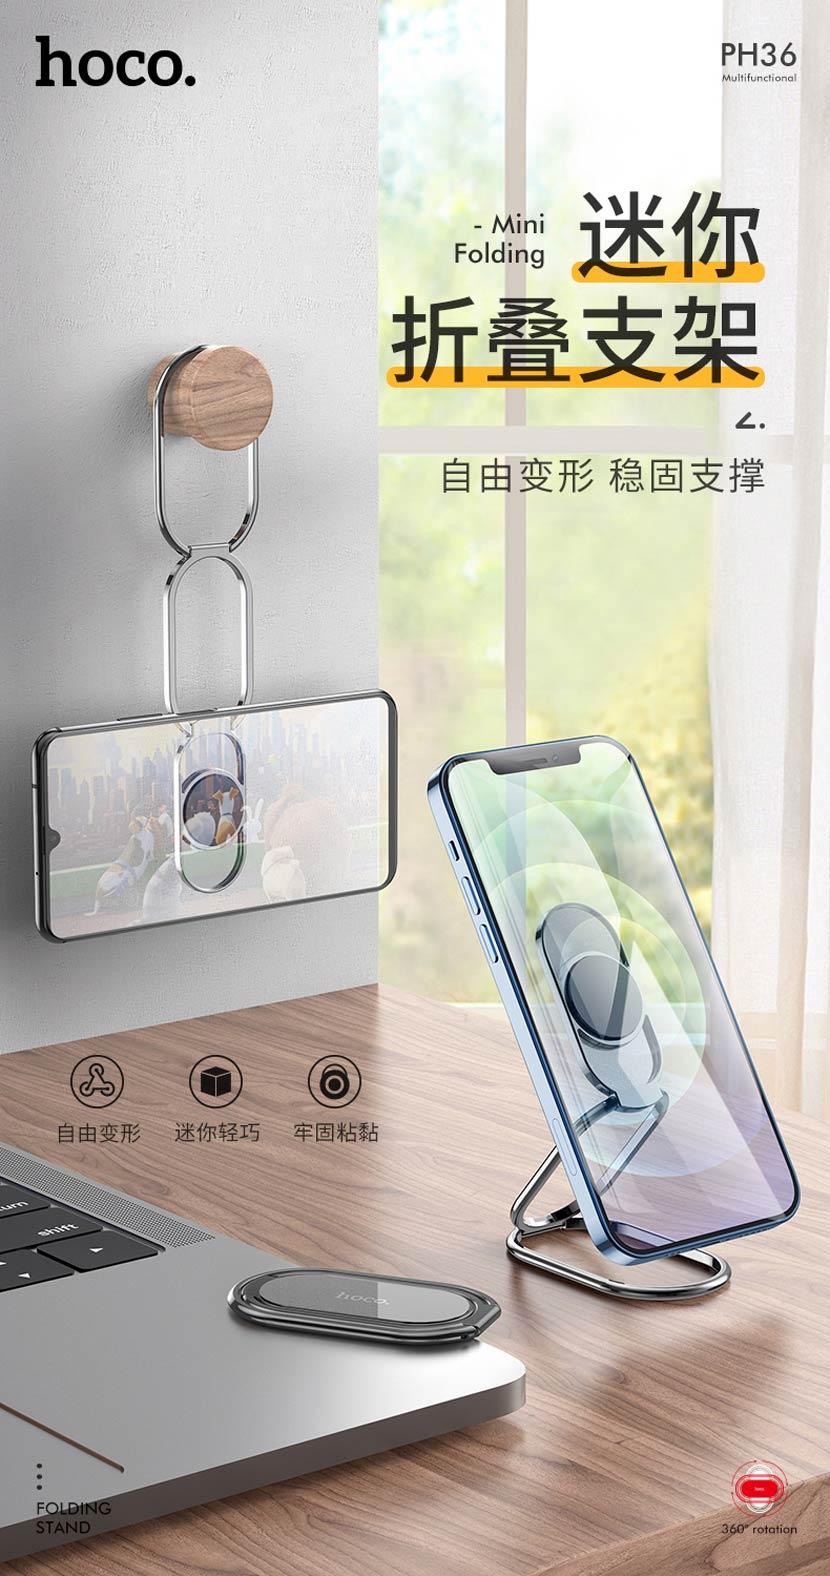 hoco news ph36 emma metal multifunctional folding stand cn